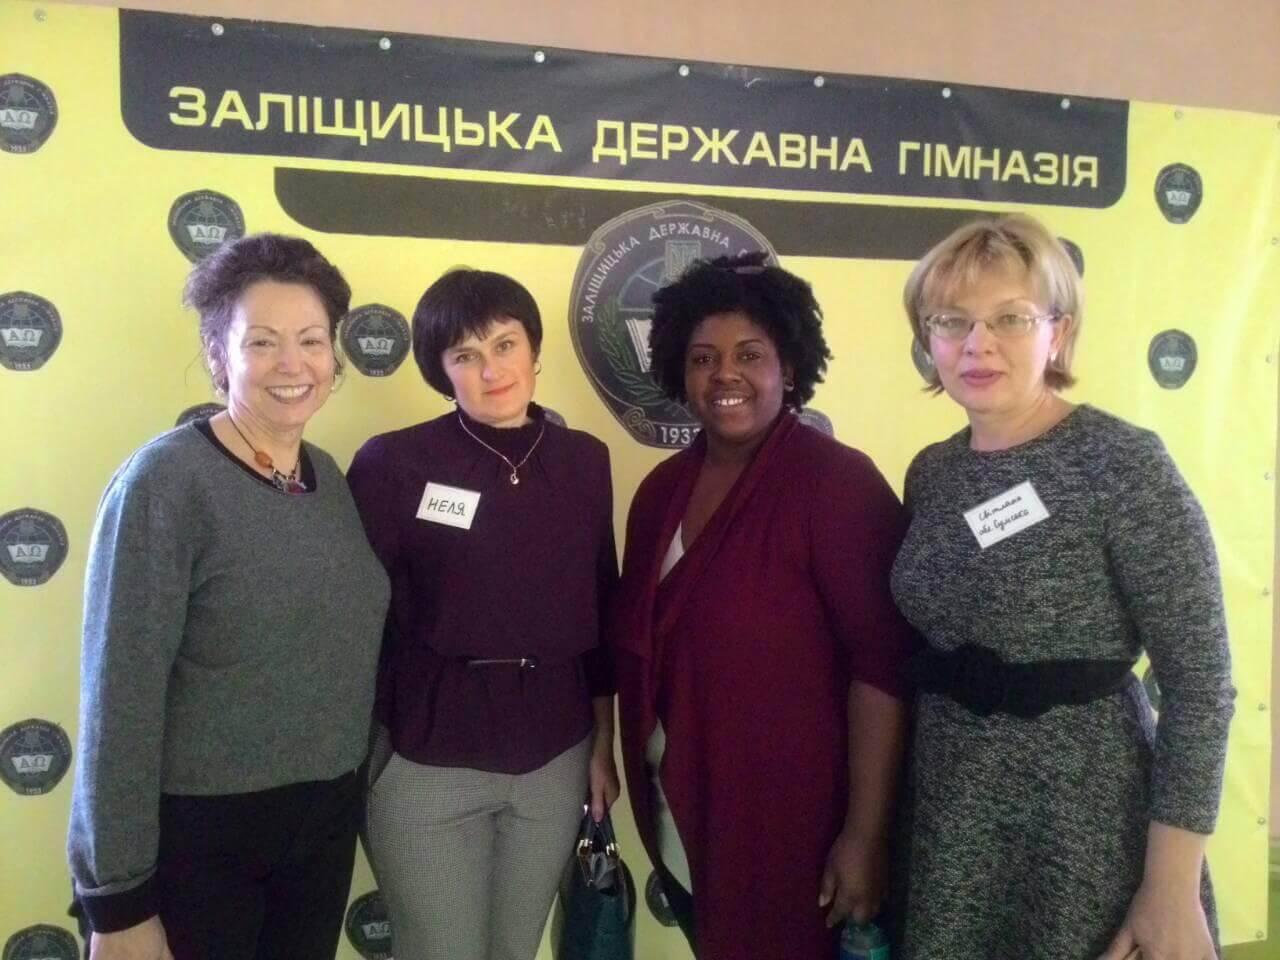 0 02 05 9394b28826f96c635dfb67d6a46f6f34c4bde9f374879777b1e36215b4a1aad9 full - Форум: Нова українська школа